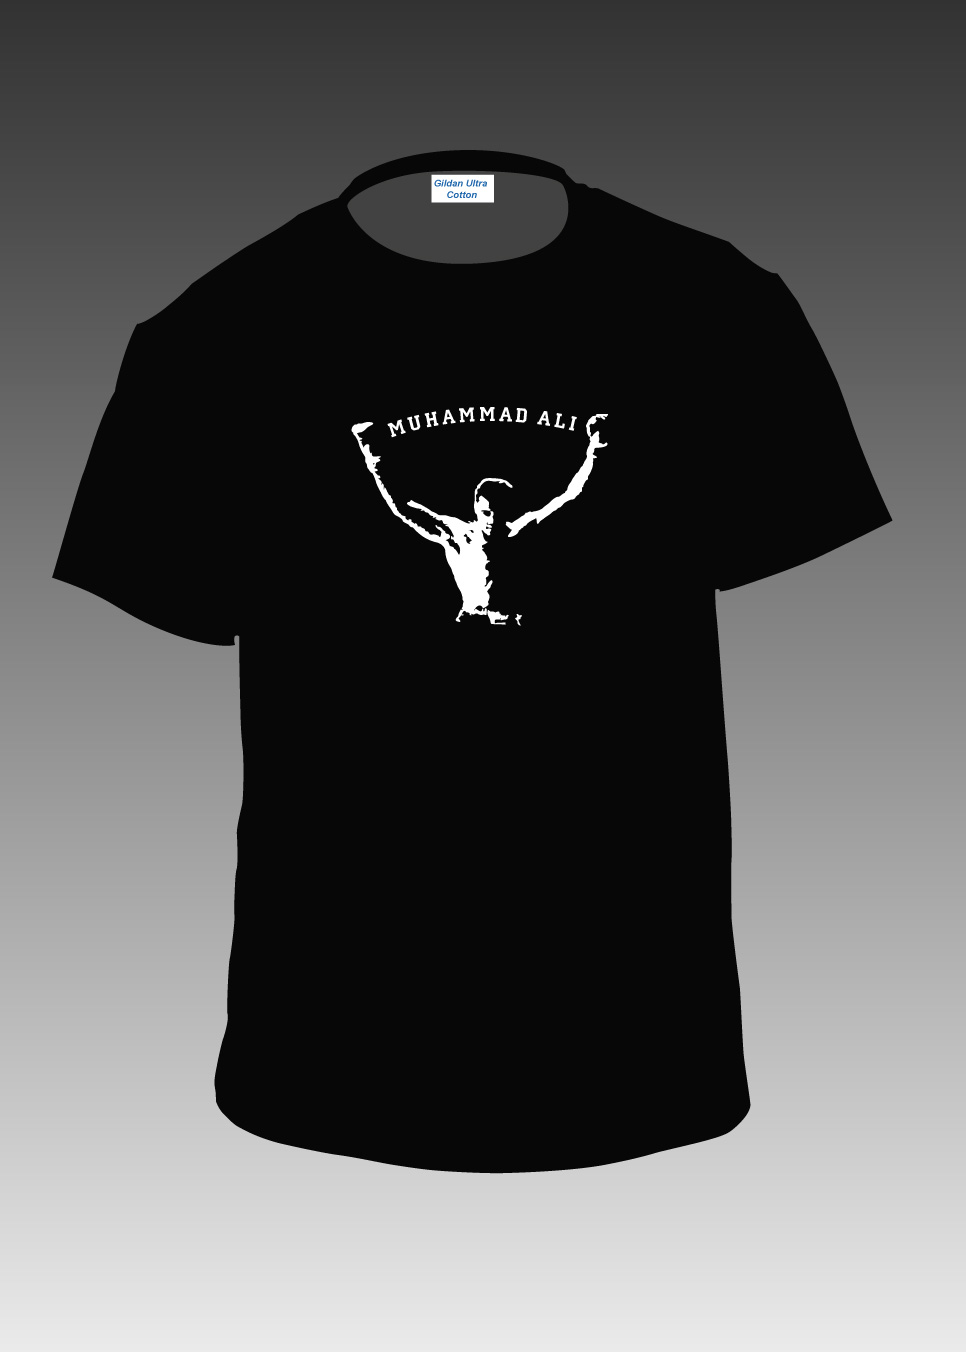 Muhammad ali champion t shirt wholesale t shirts cool funky